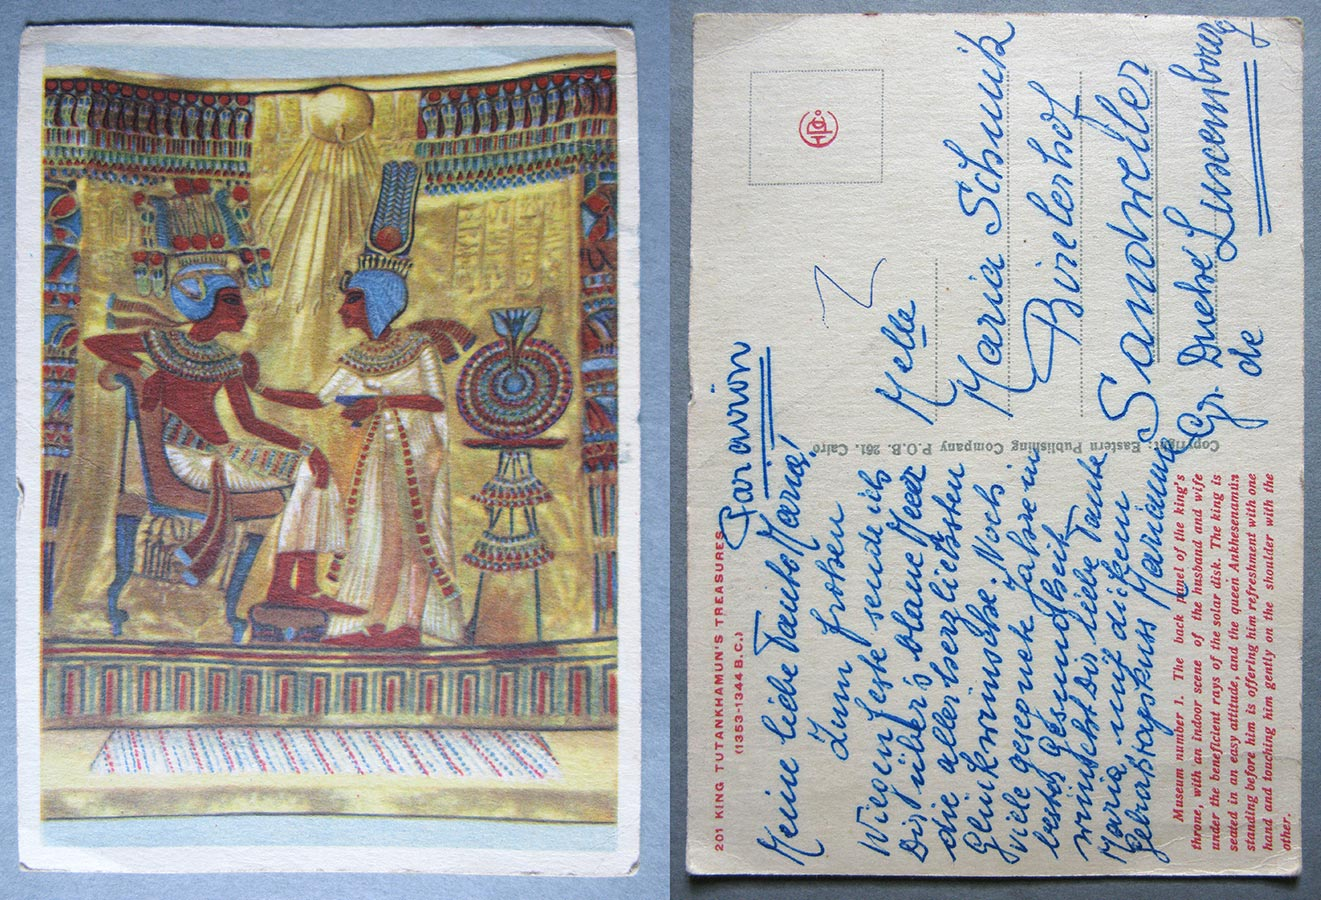 © Eastern Publishing Company P.O.B., Cairo